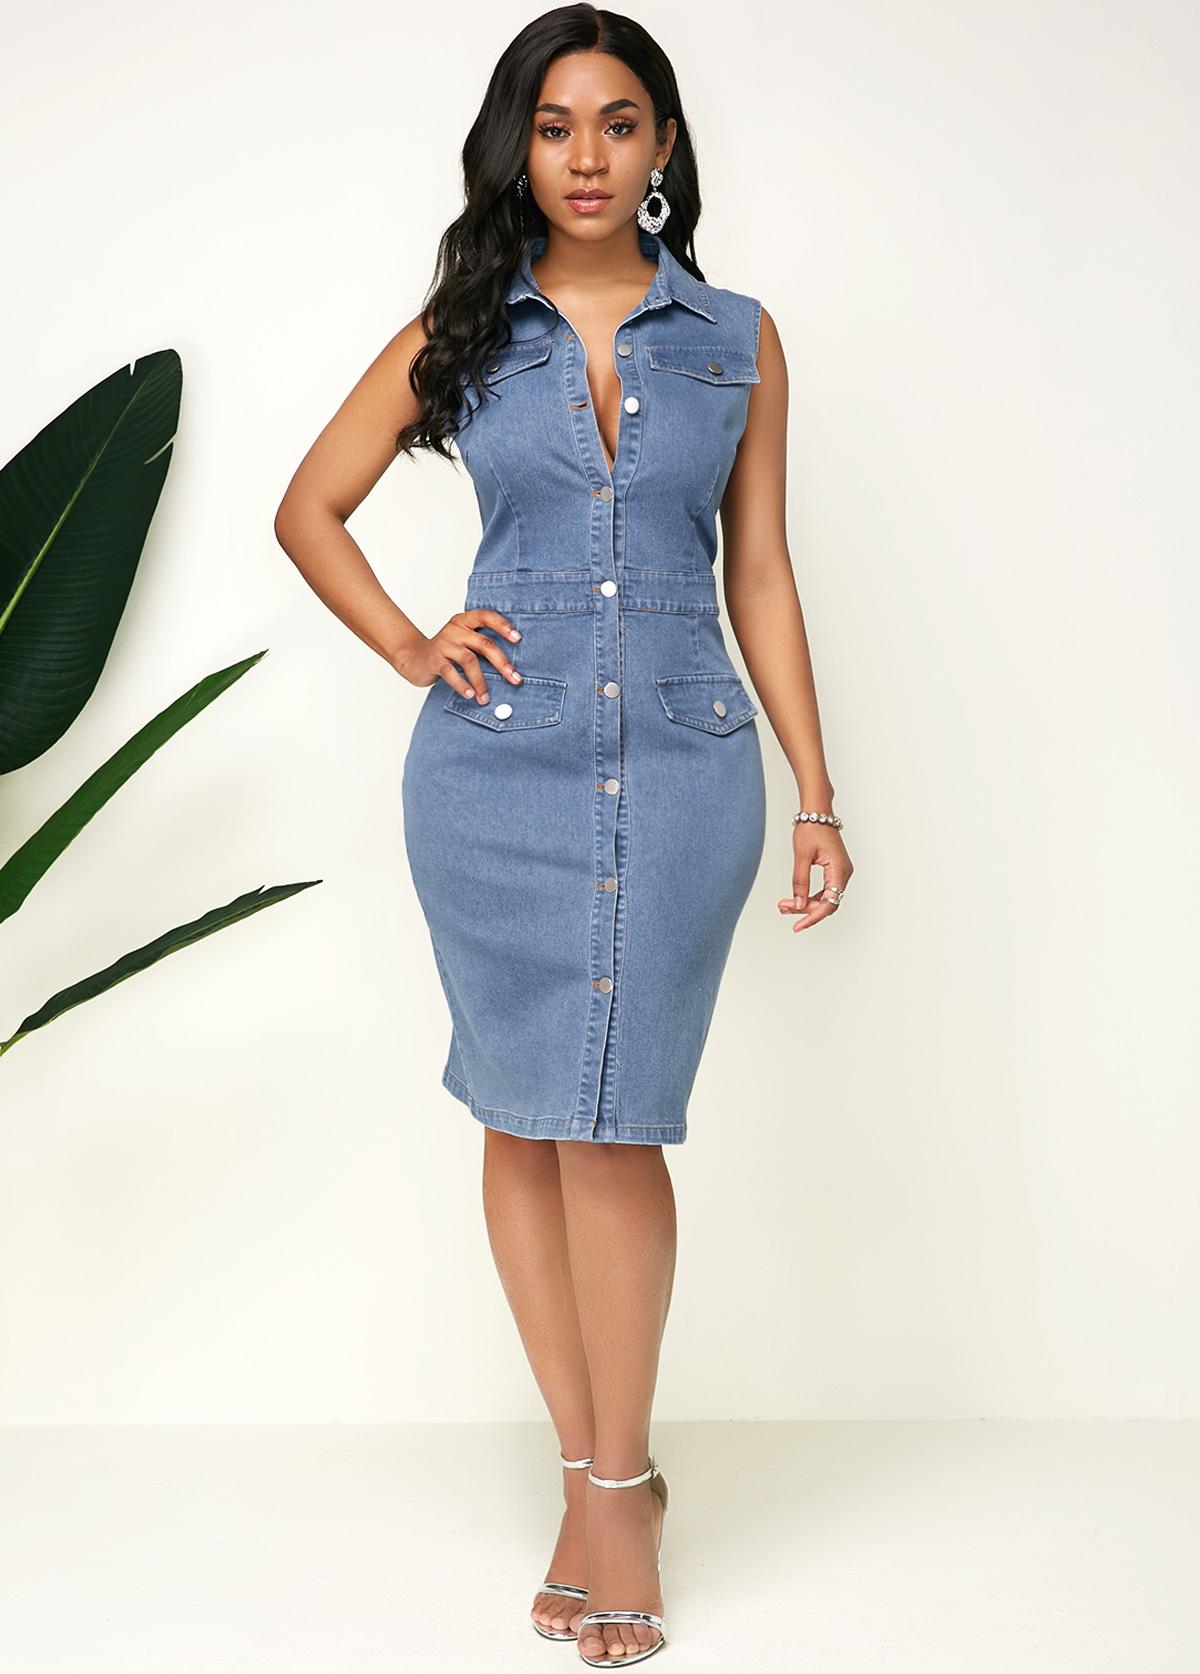 ROTITA Sleeveless Button Up Turndown Collar Denim Dress